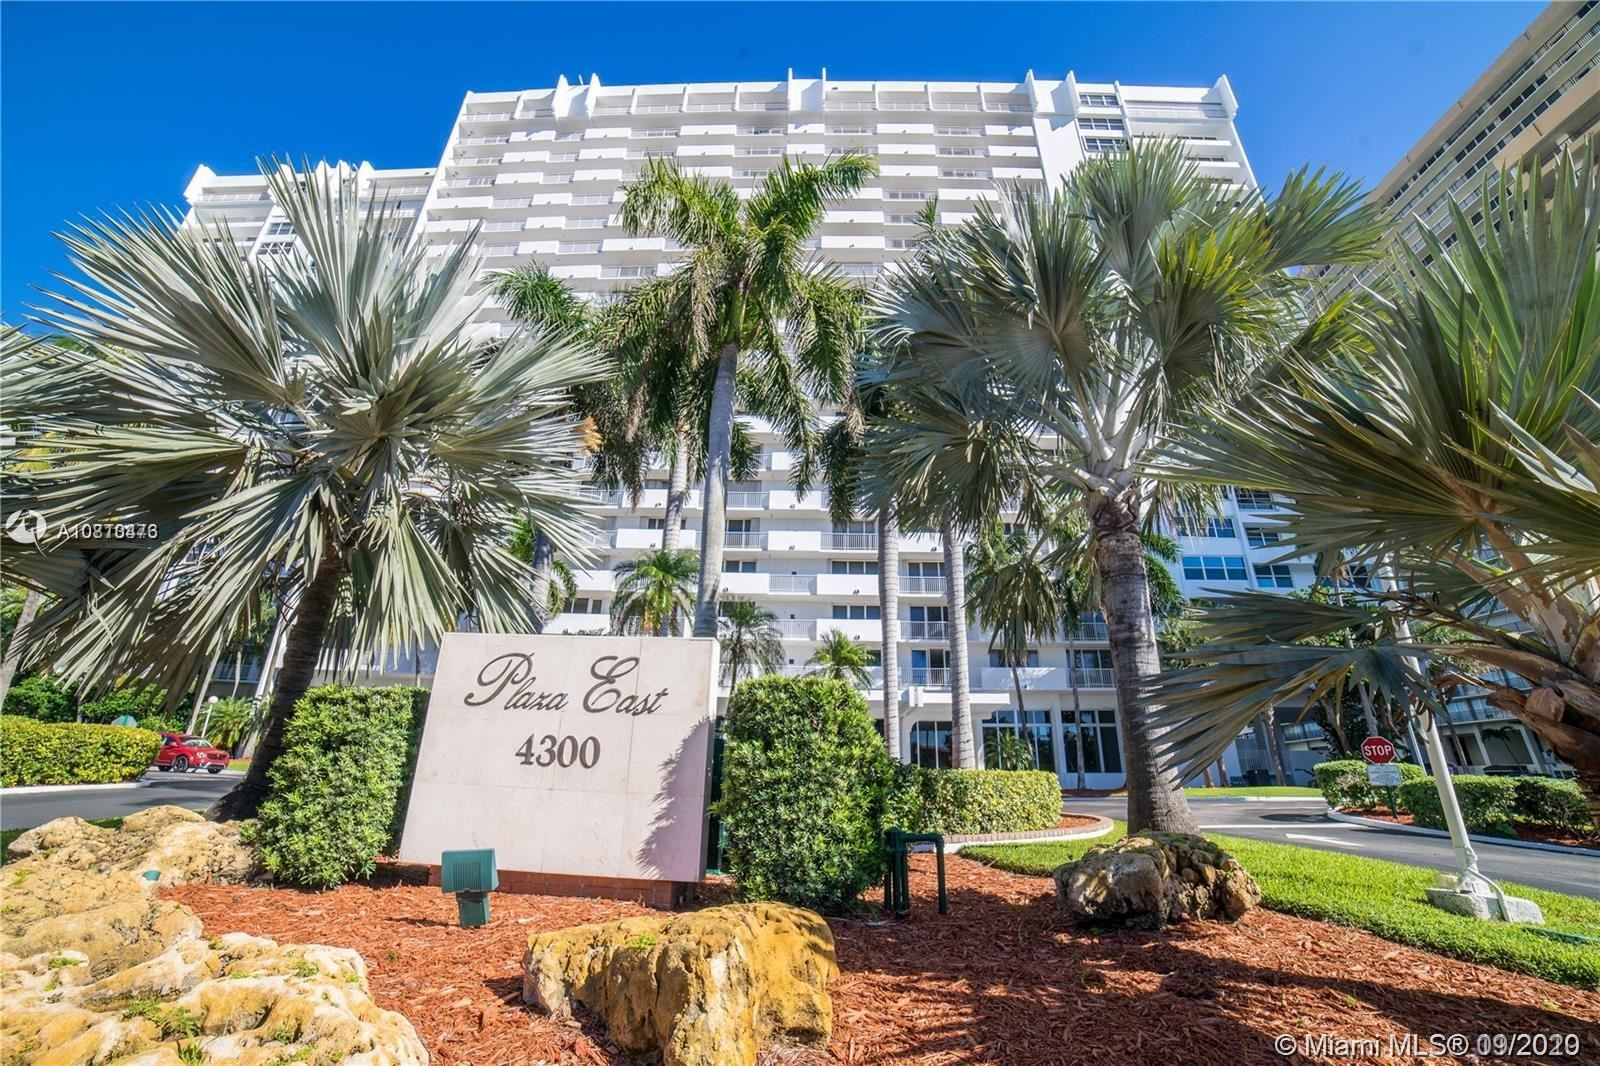 4300 N Ocean Blvd #7H, Fort Lauderdale, FL 33308 - #: A10810473